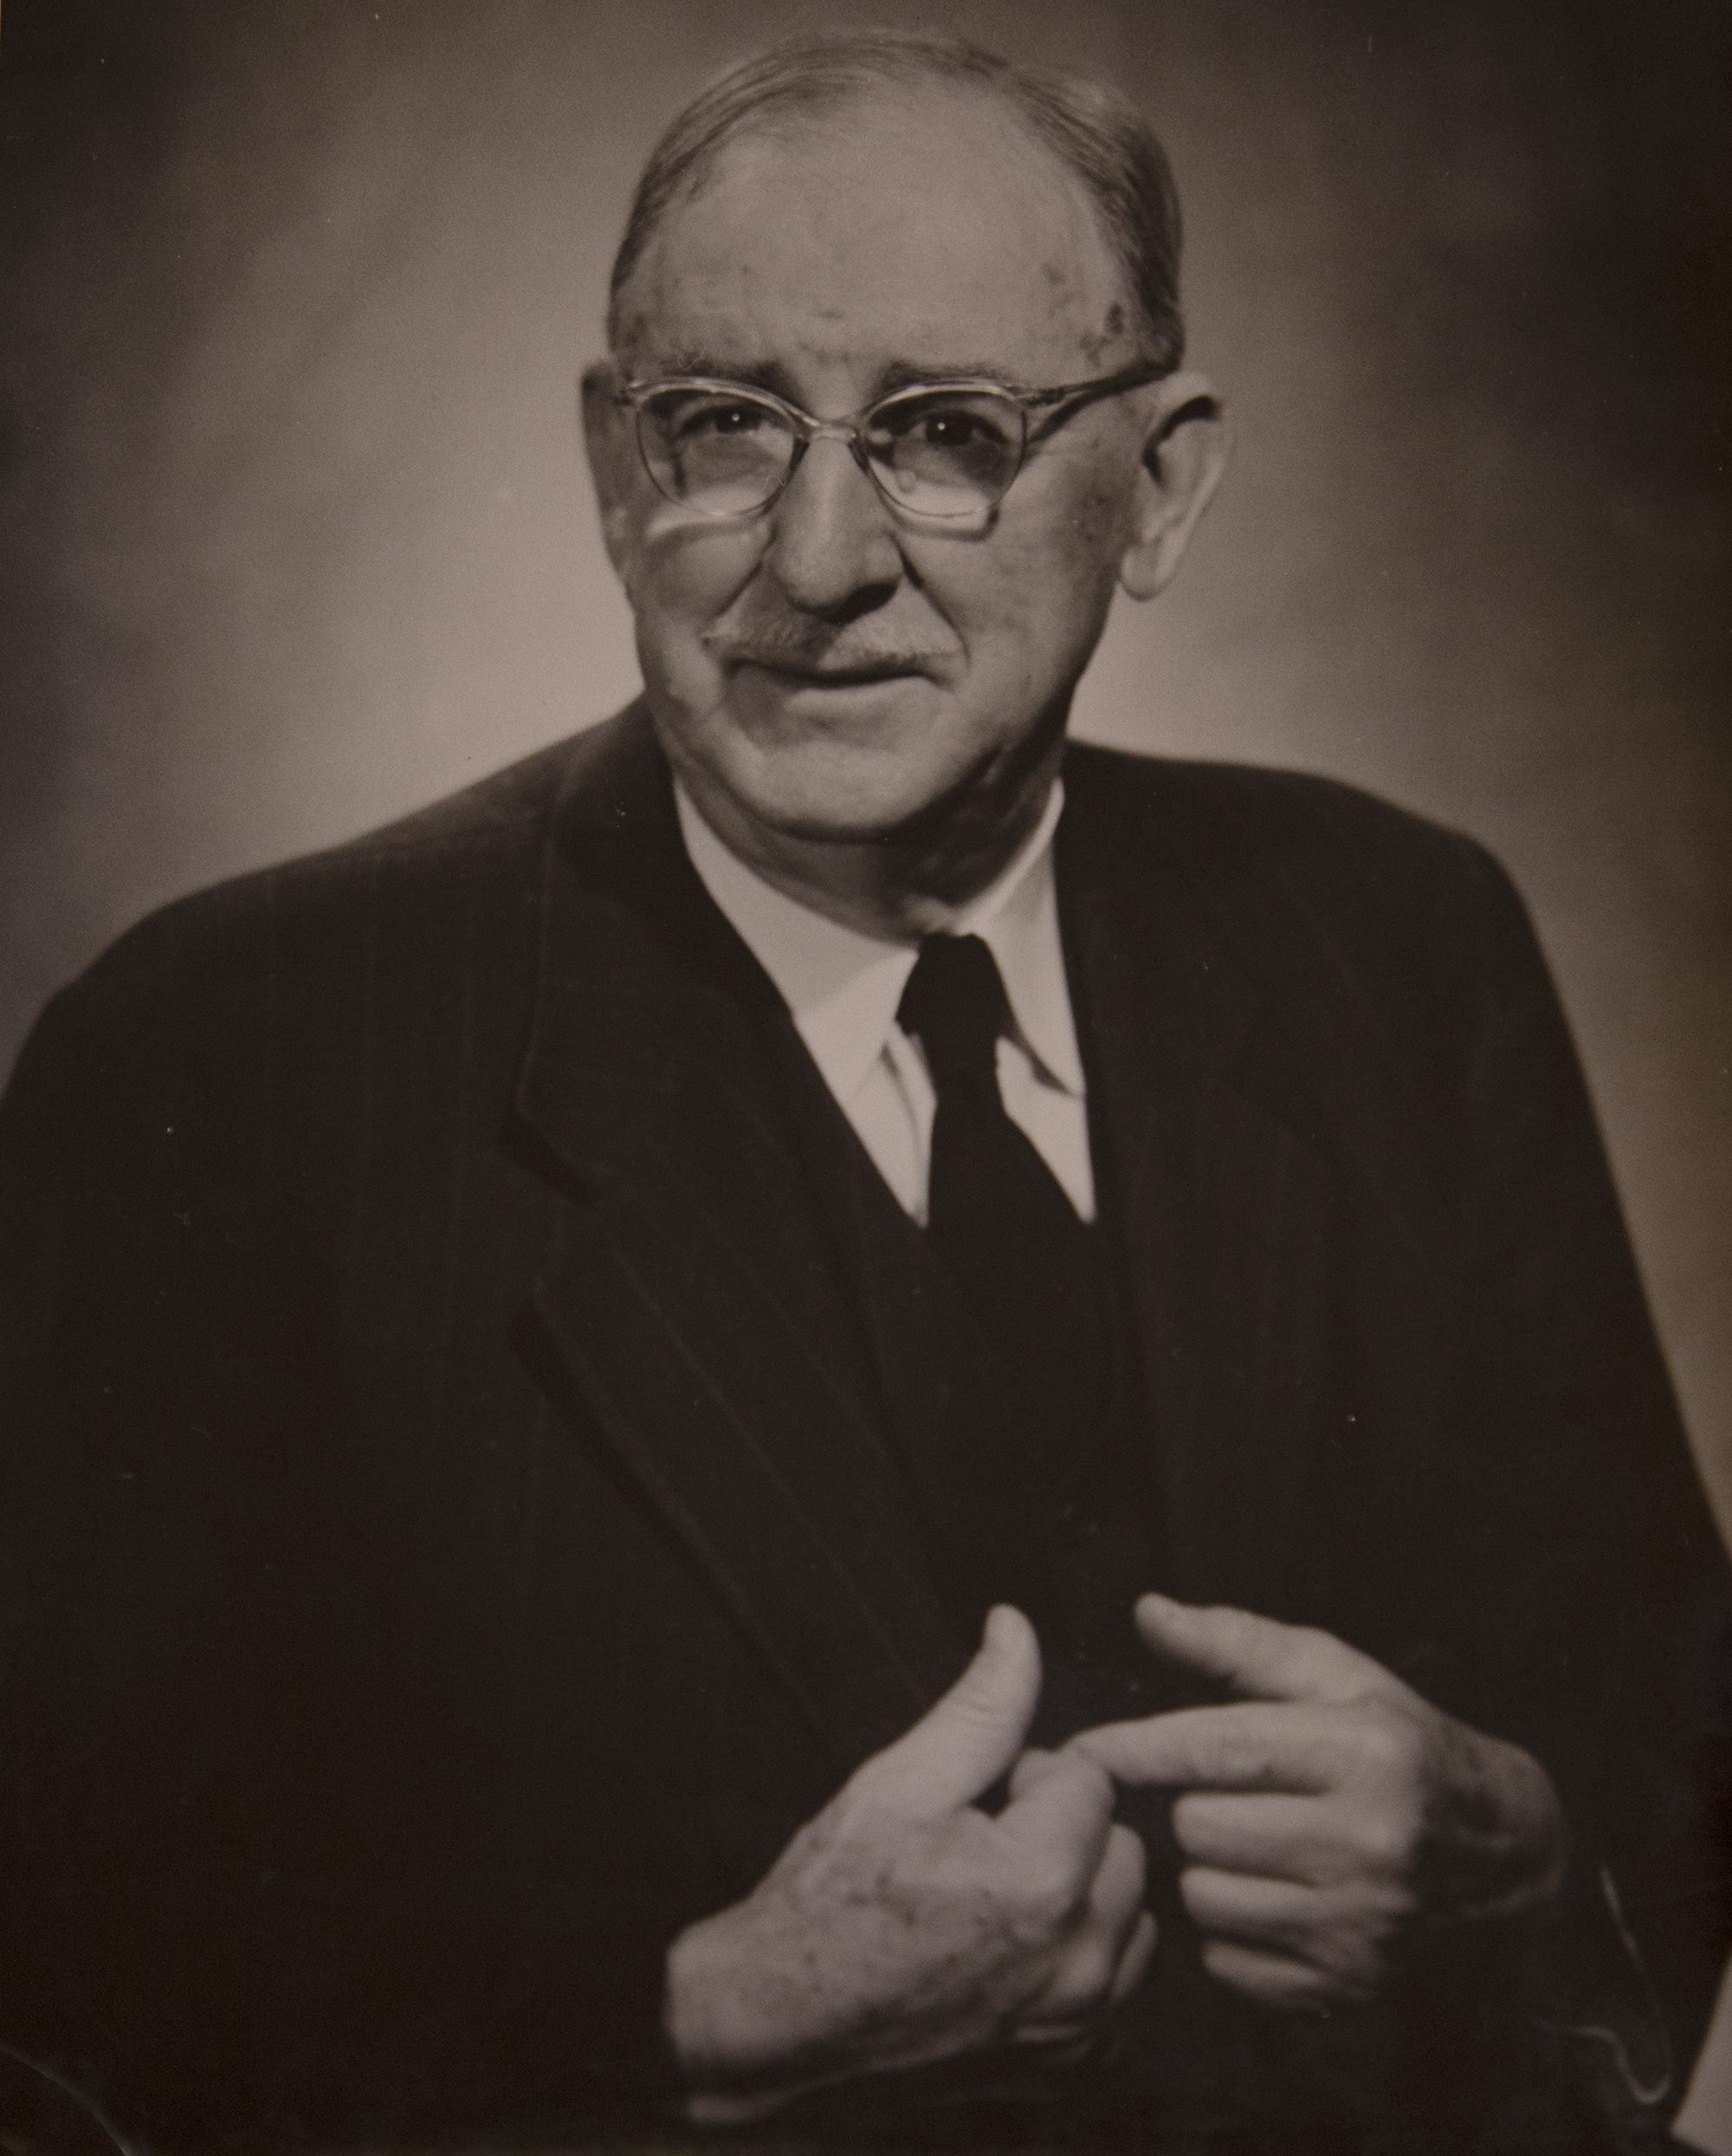 Howard Odum